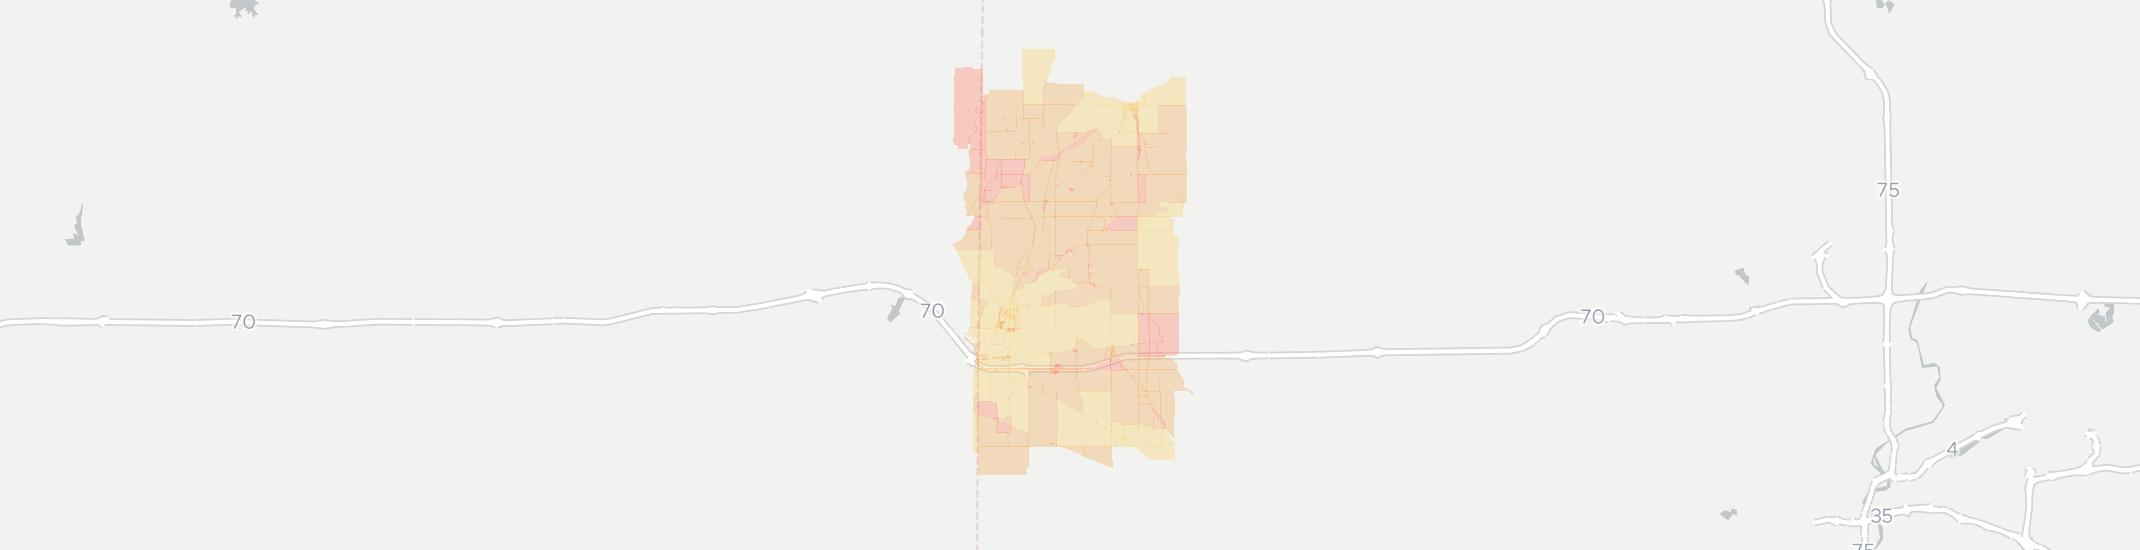 New Paris Ohio Map.Internet Providers In New Paris Oh Compare 14 Providers